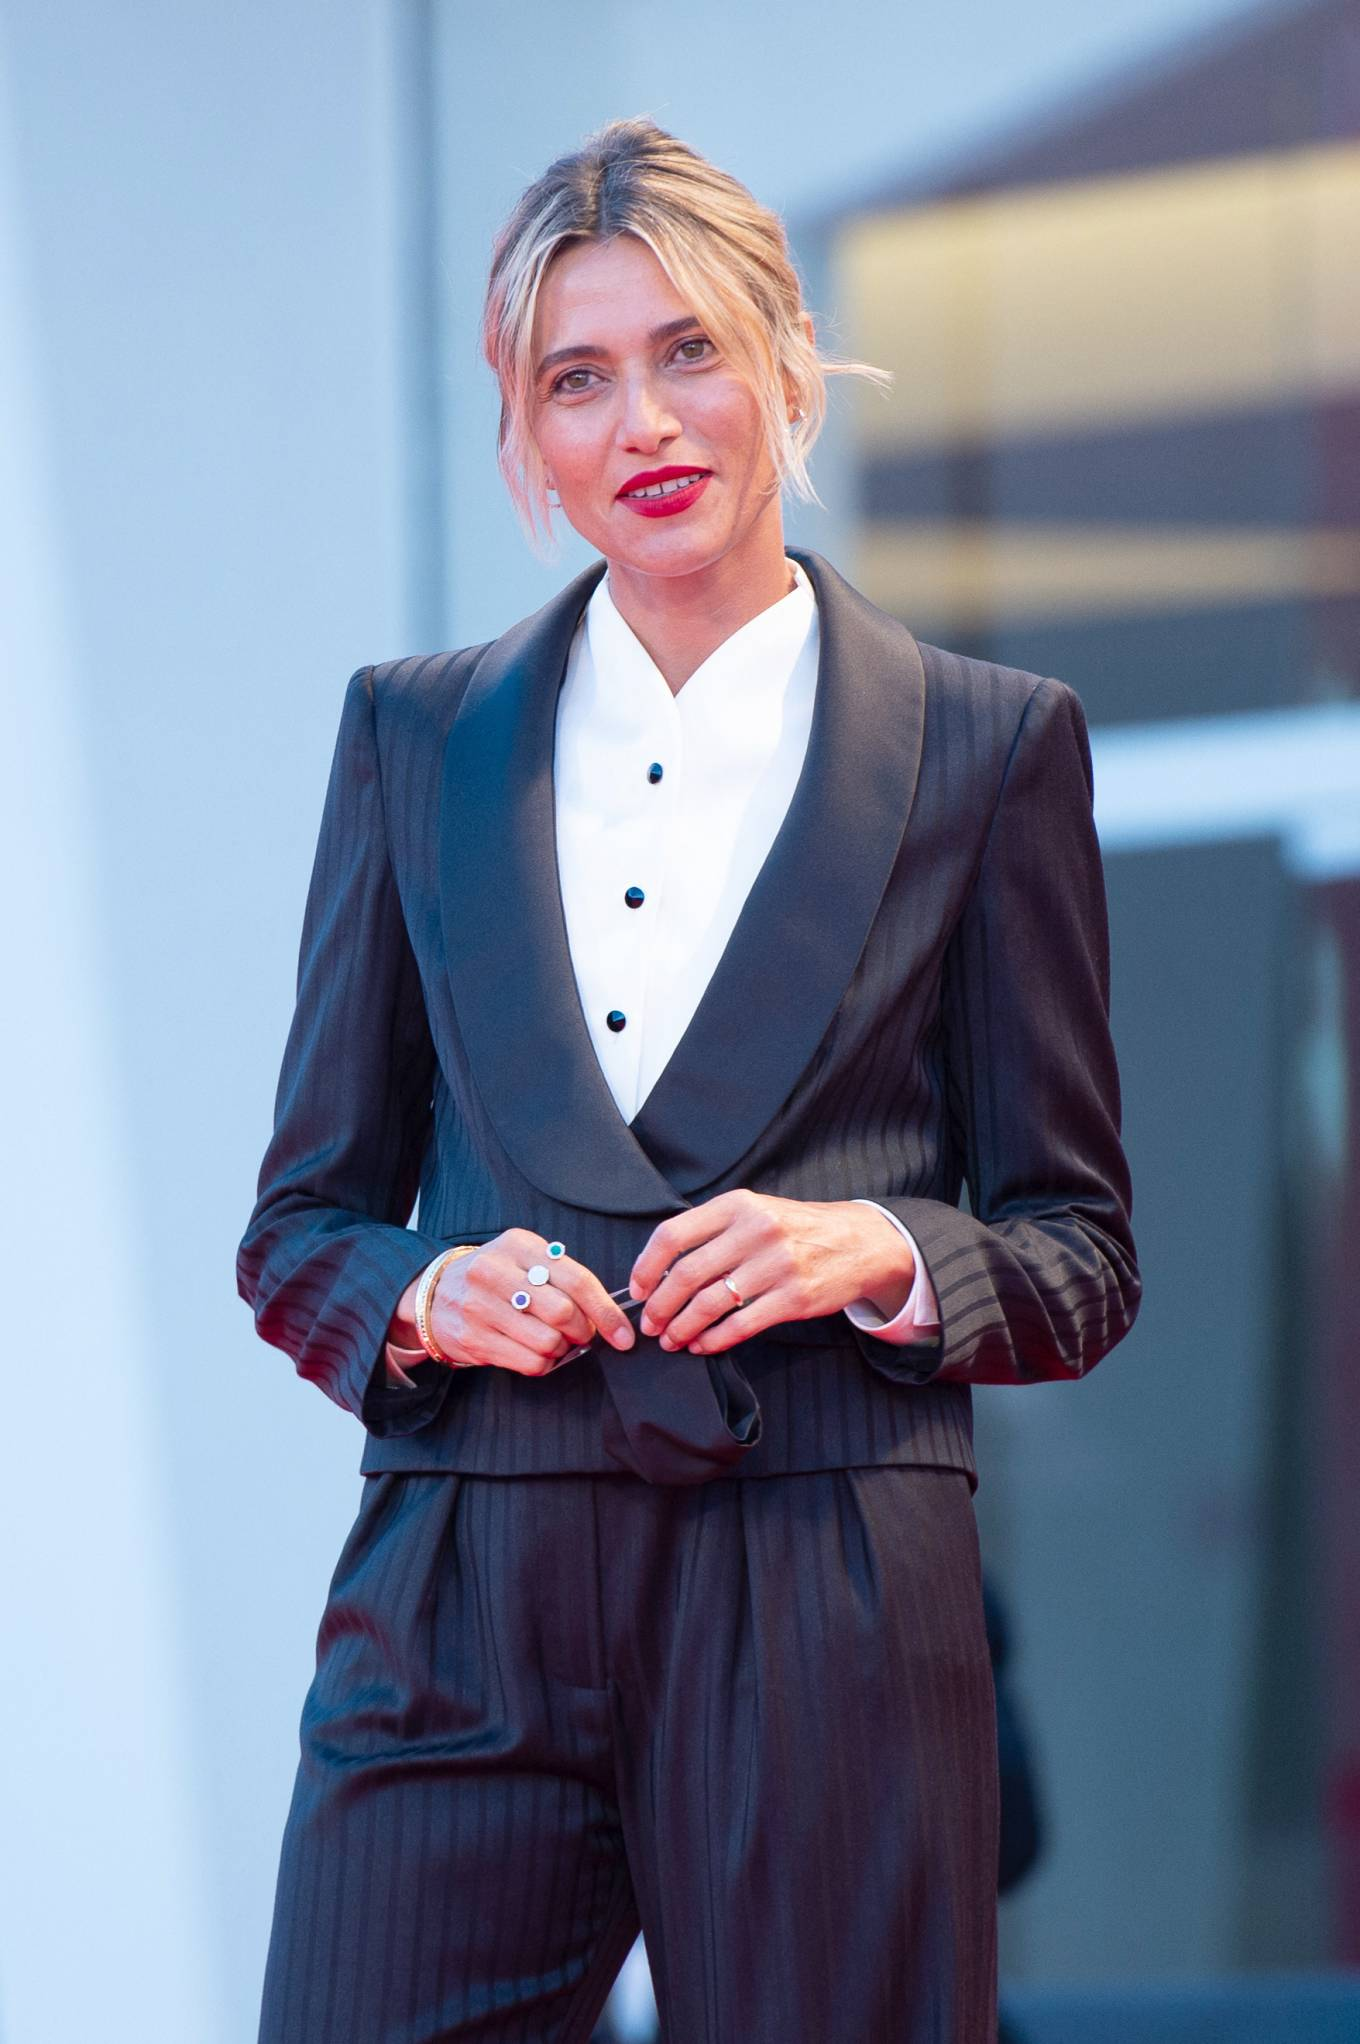 Anna Foglietta cùng thời trang thảm đỏ venice